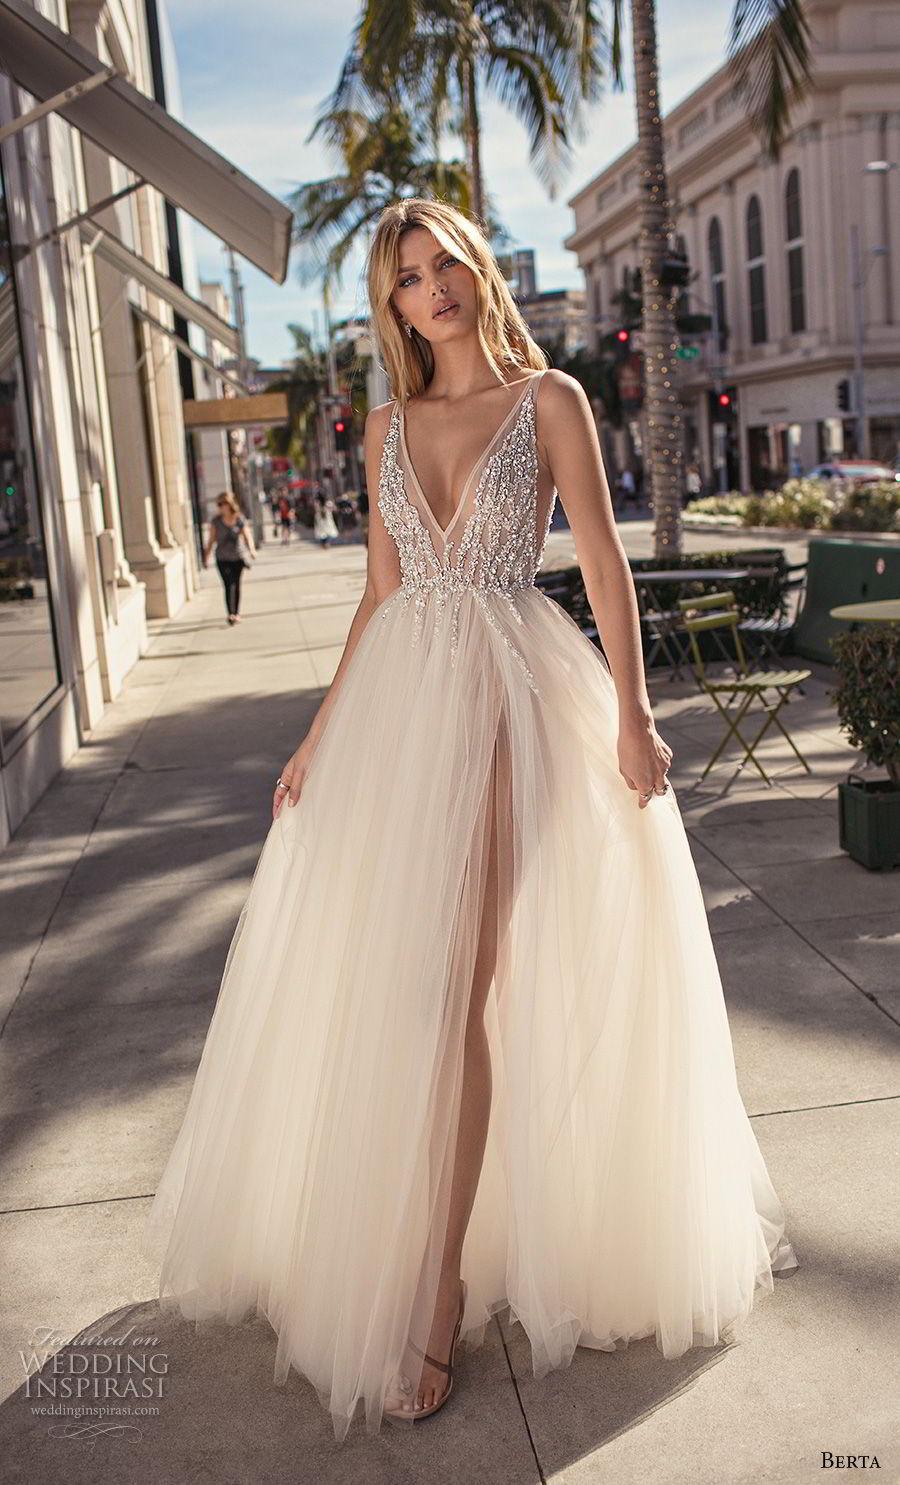 berta 2019 muse bridal sleeveless deep v neck heavily embellished bodice slit skirt glitzy romantic a  line wedding dress v back chapel train (11) mv